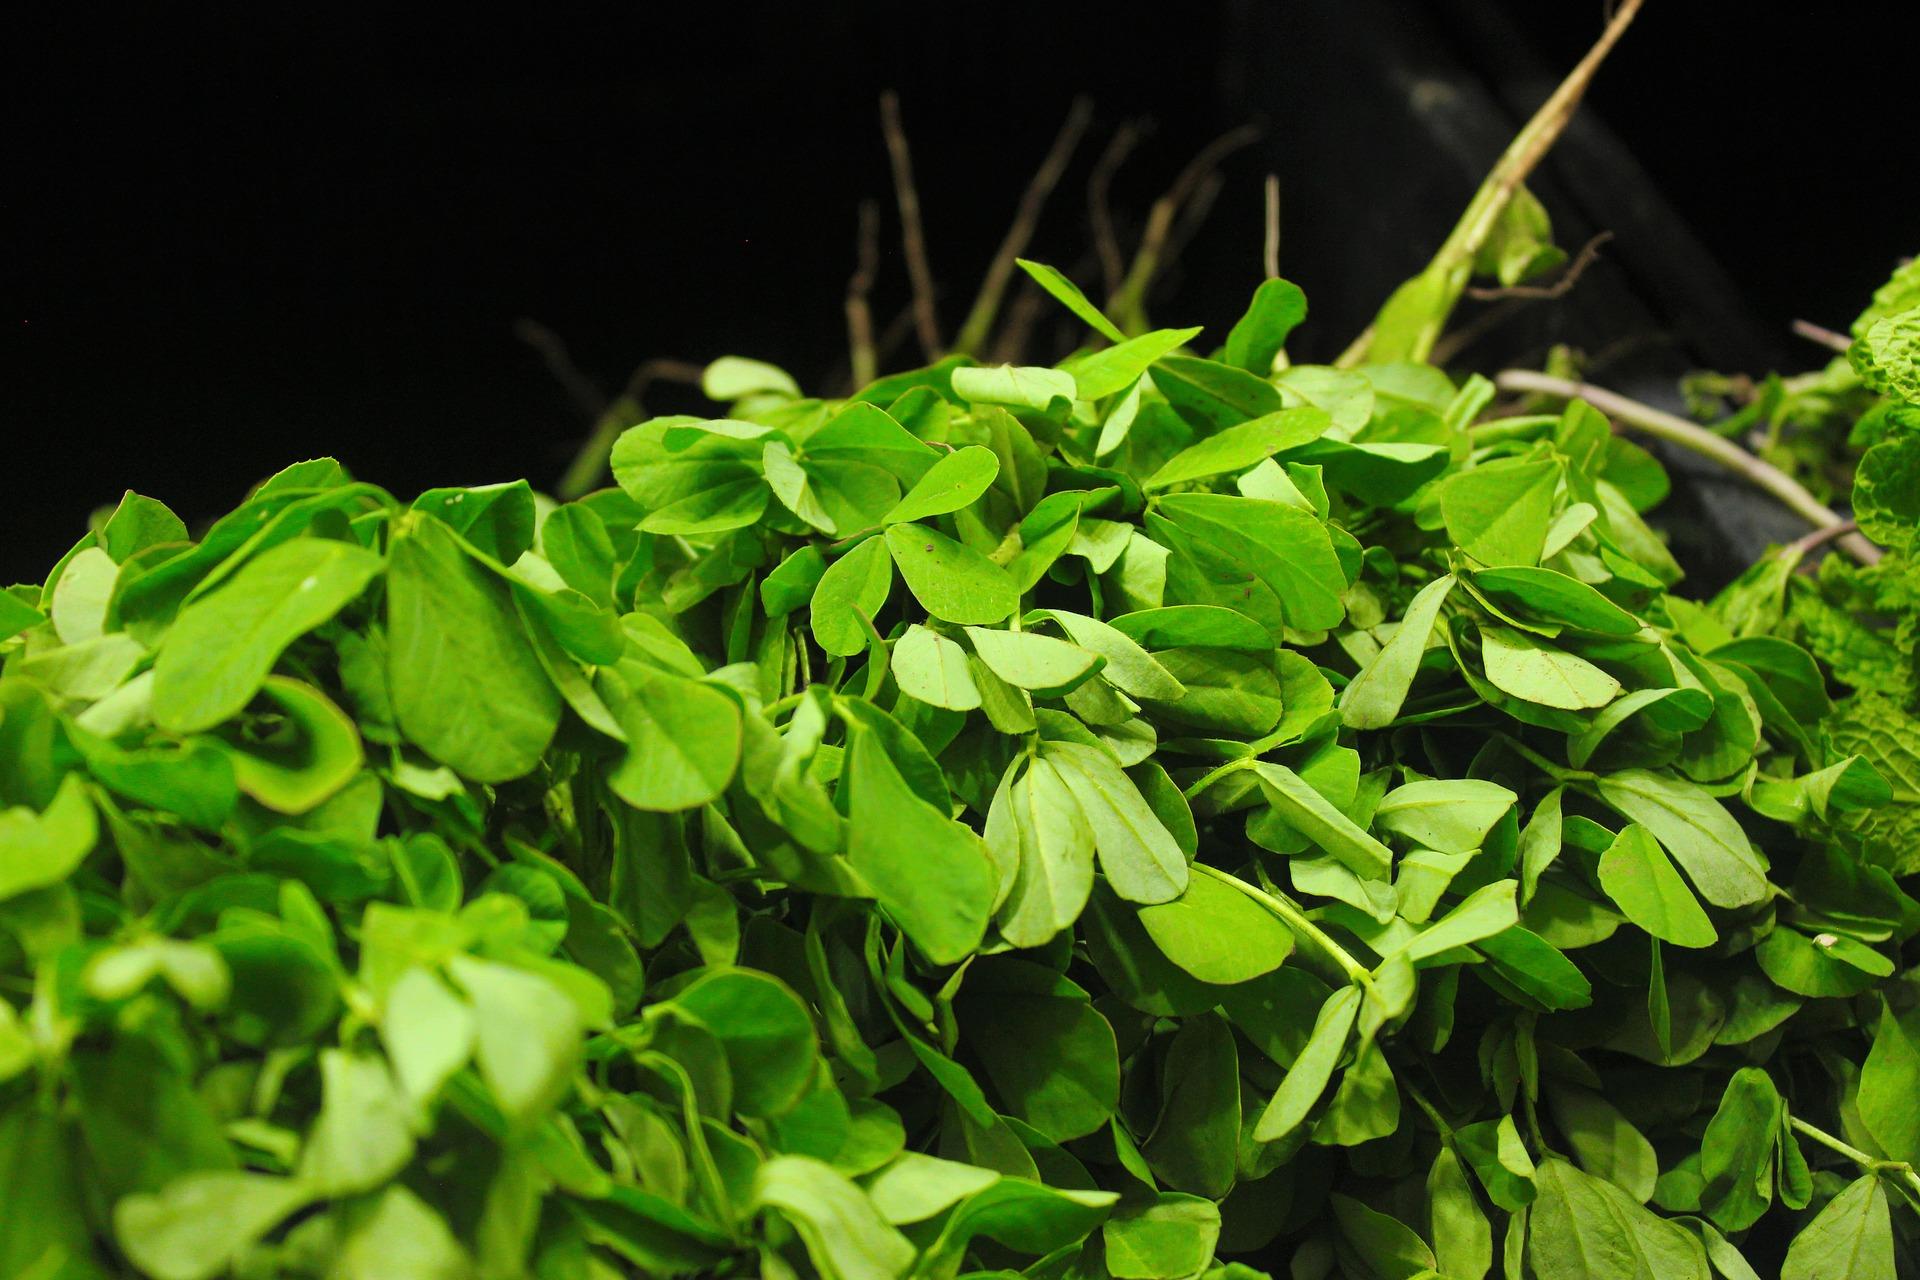 fenugreek-spice-or-medicine